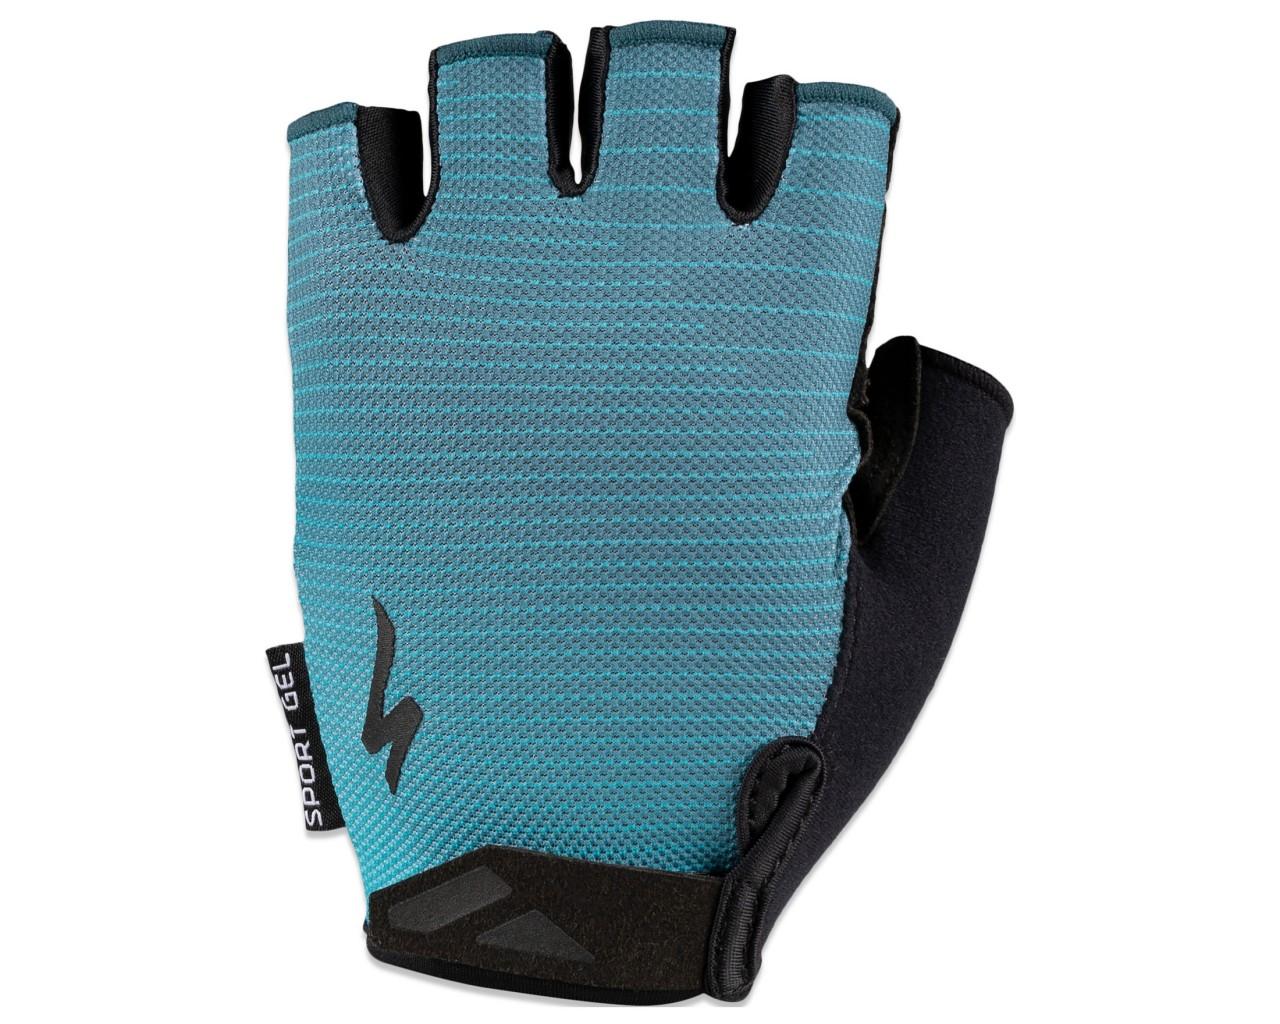 Specialized BG Sport Gel Damen Handschuhe kurzfinger | aqua-dusty turquoise arrow